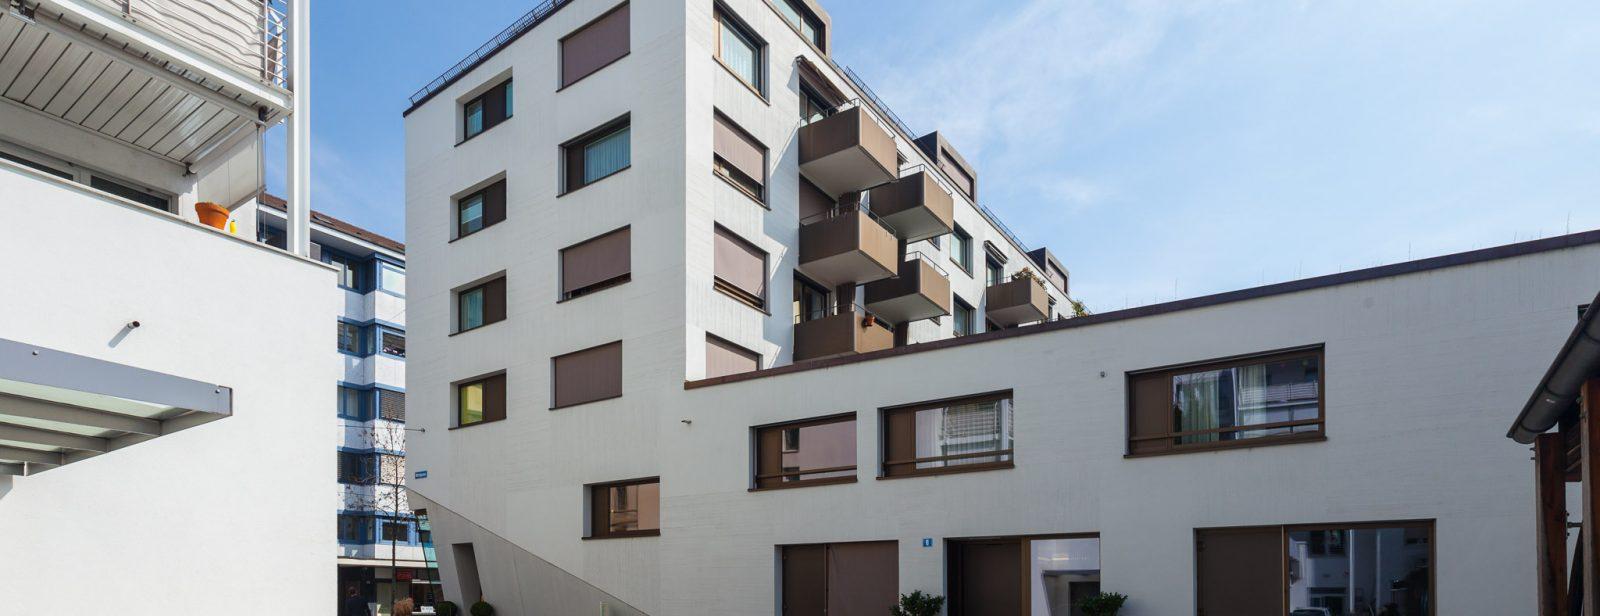 Neubau Seefeldstrasse 54, 8008 Zürich